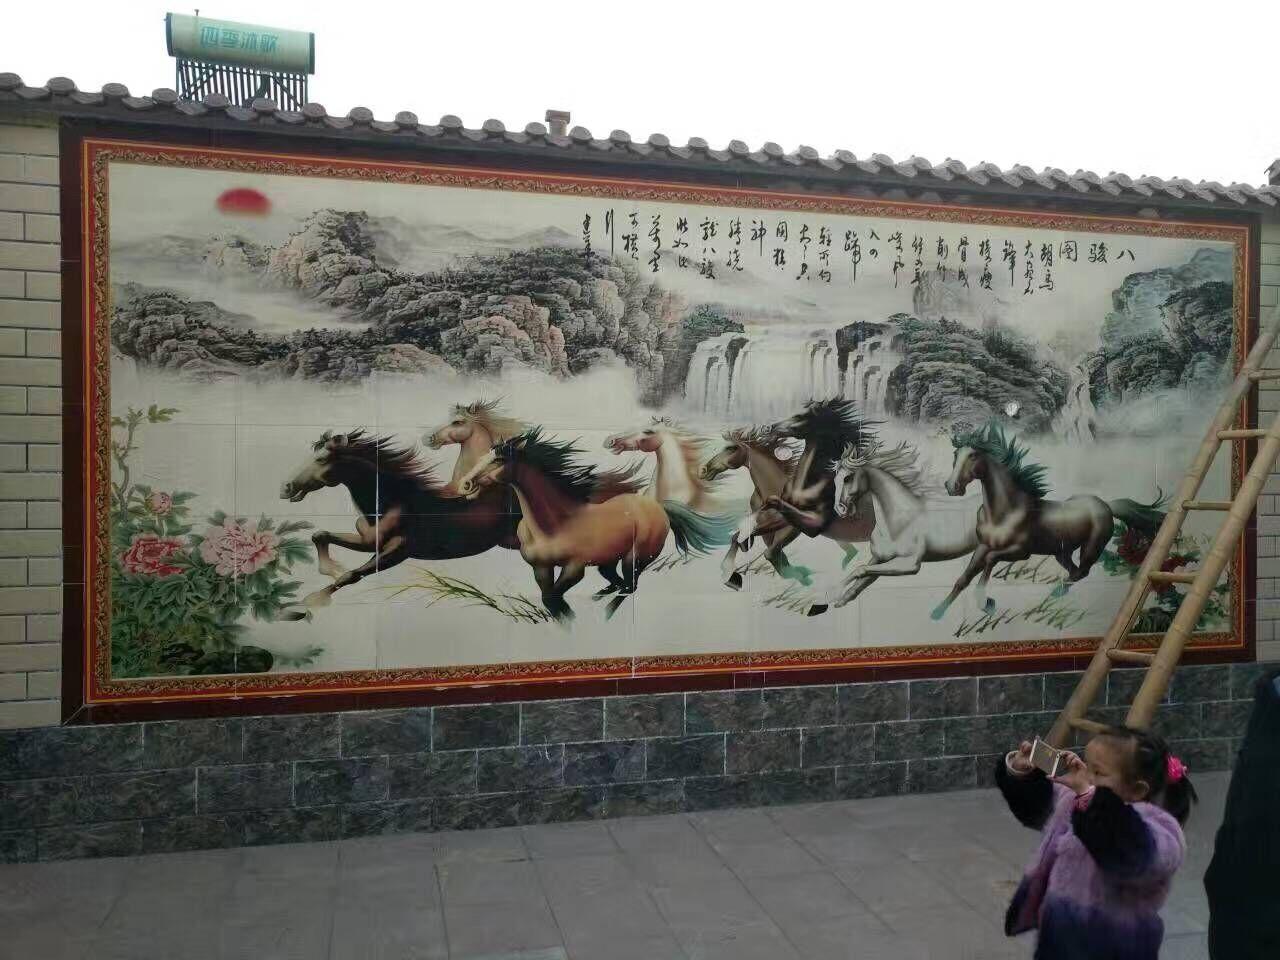 壁画陶瓷招商